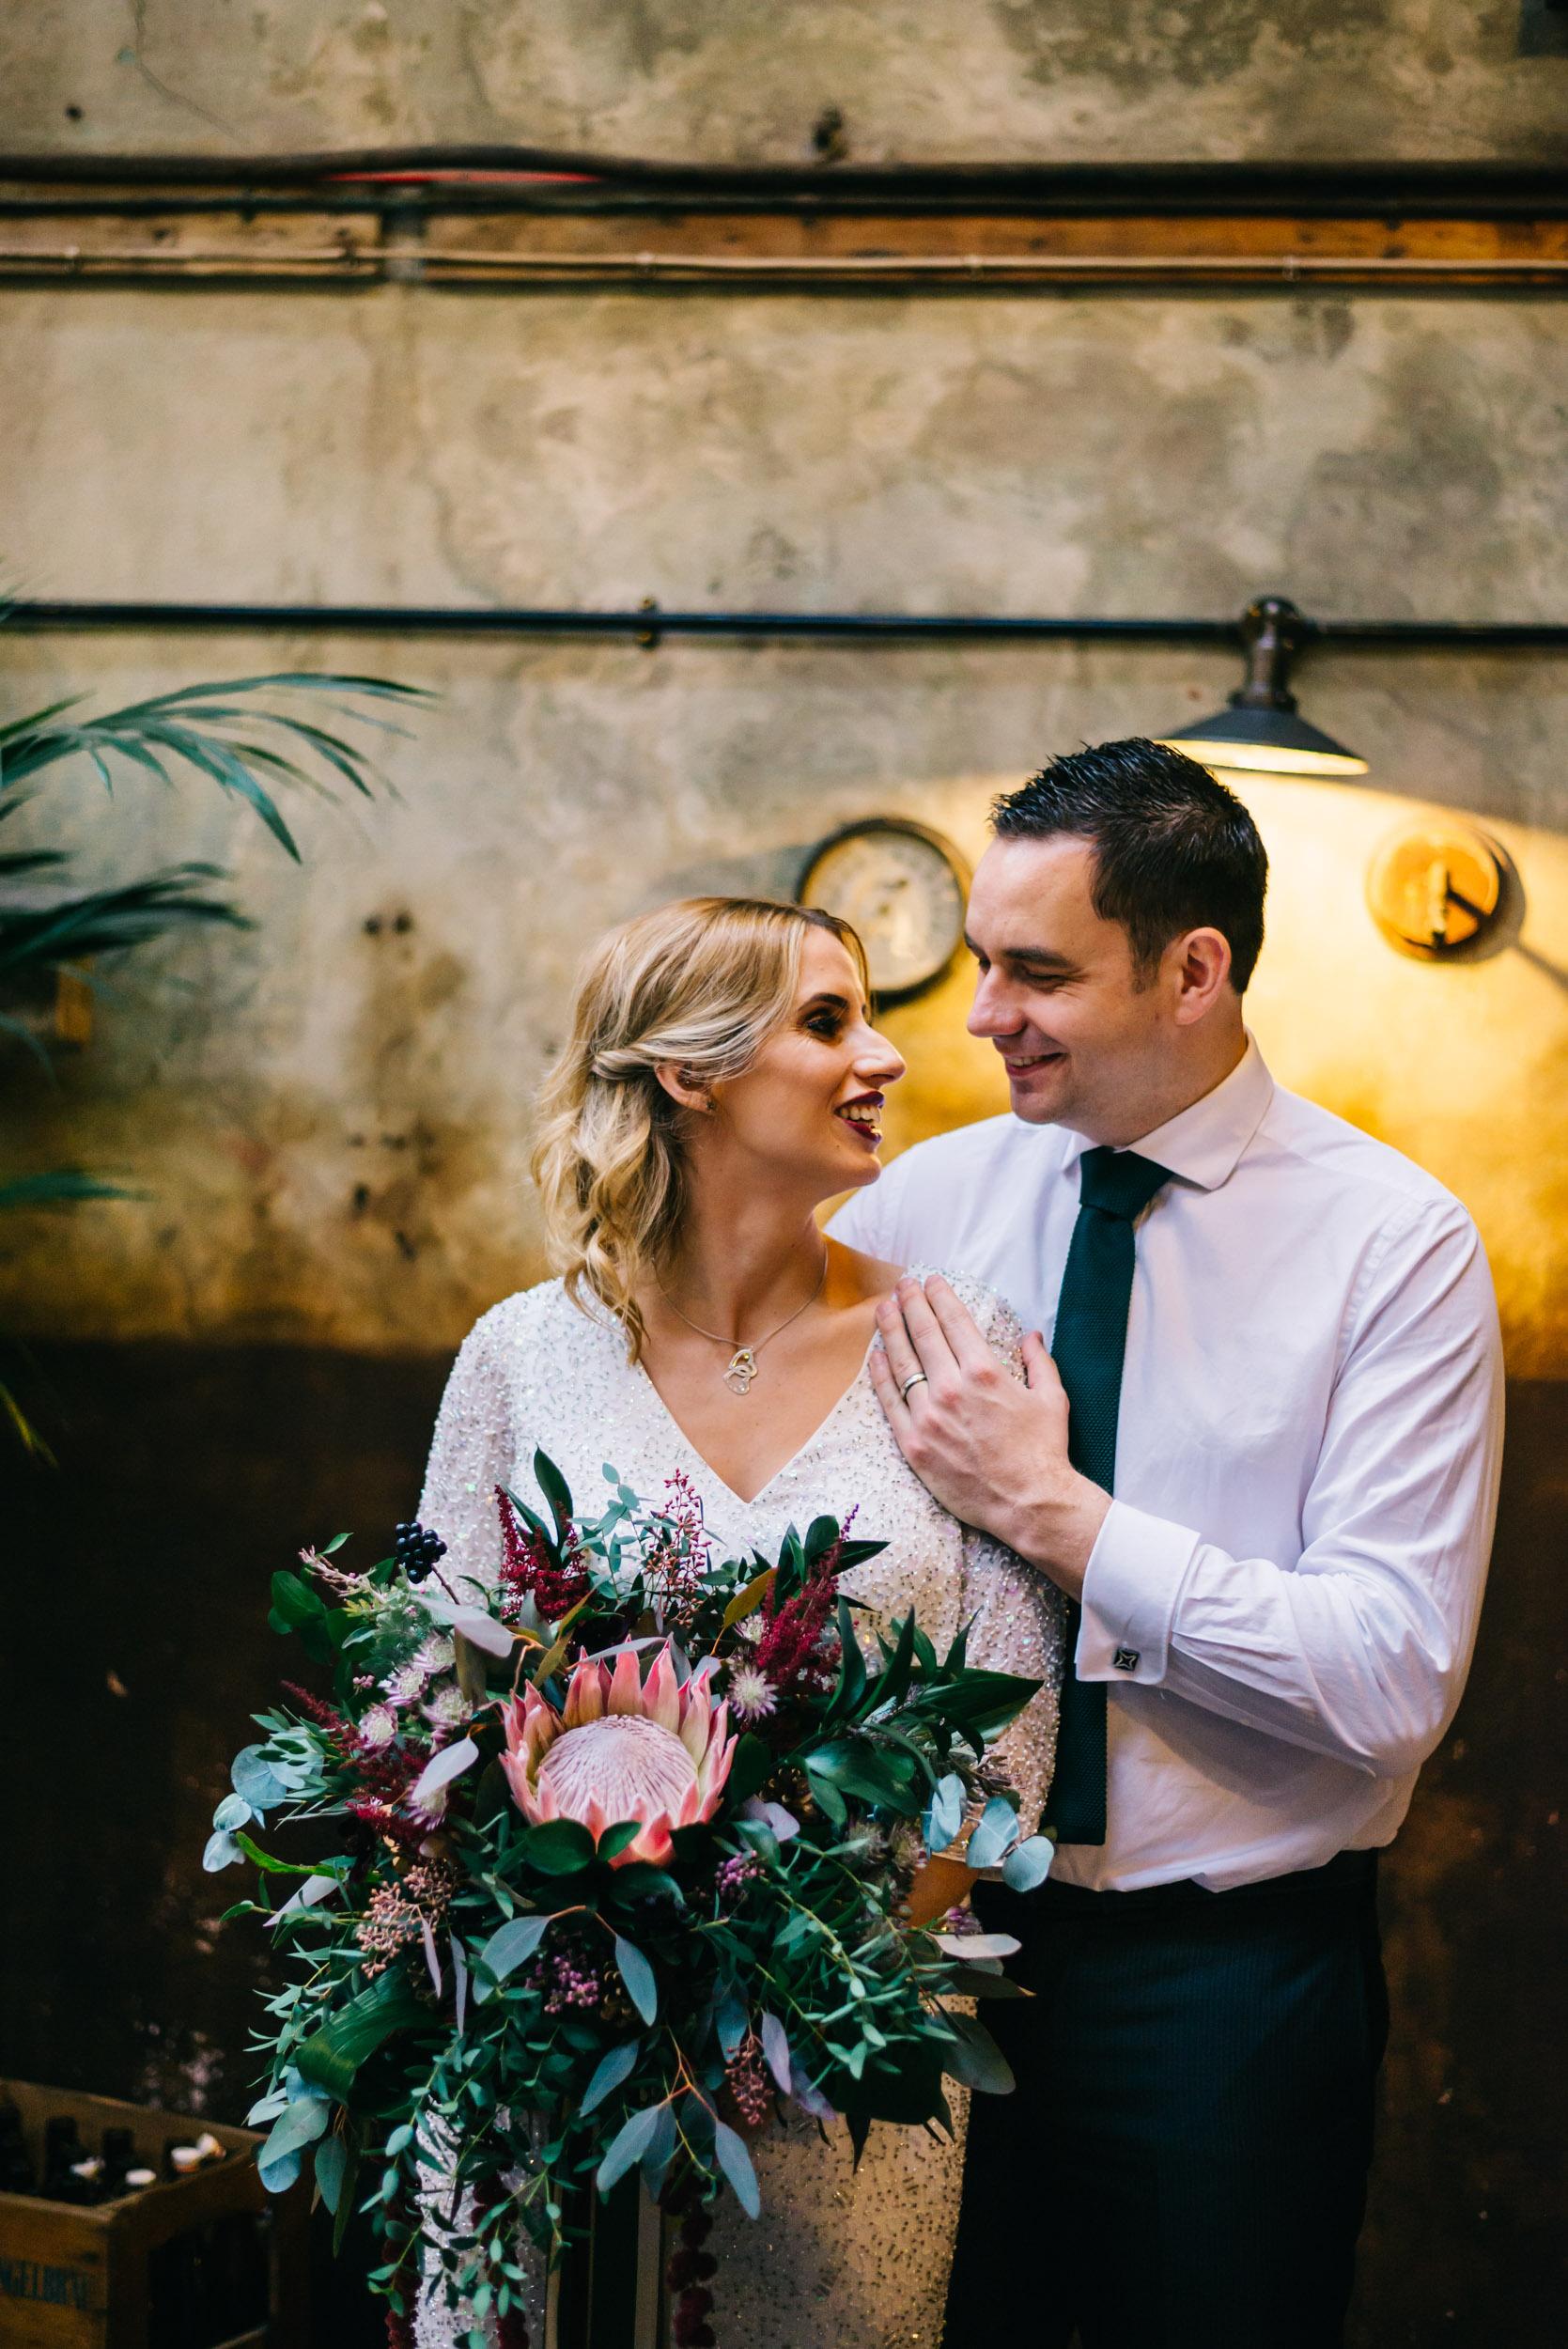 Holmes Mill, Clitheroe, Lancashire - Styled Wedding Shoot-5.jpg